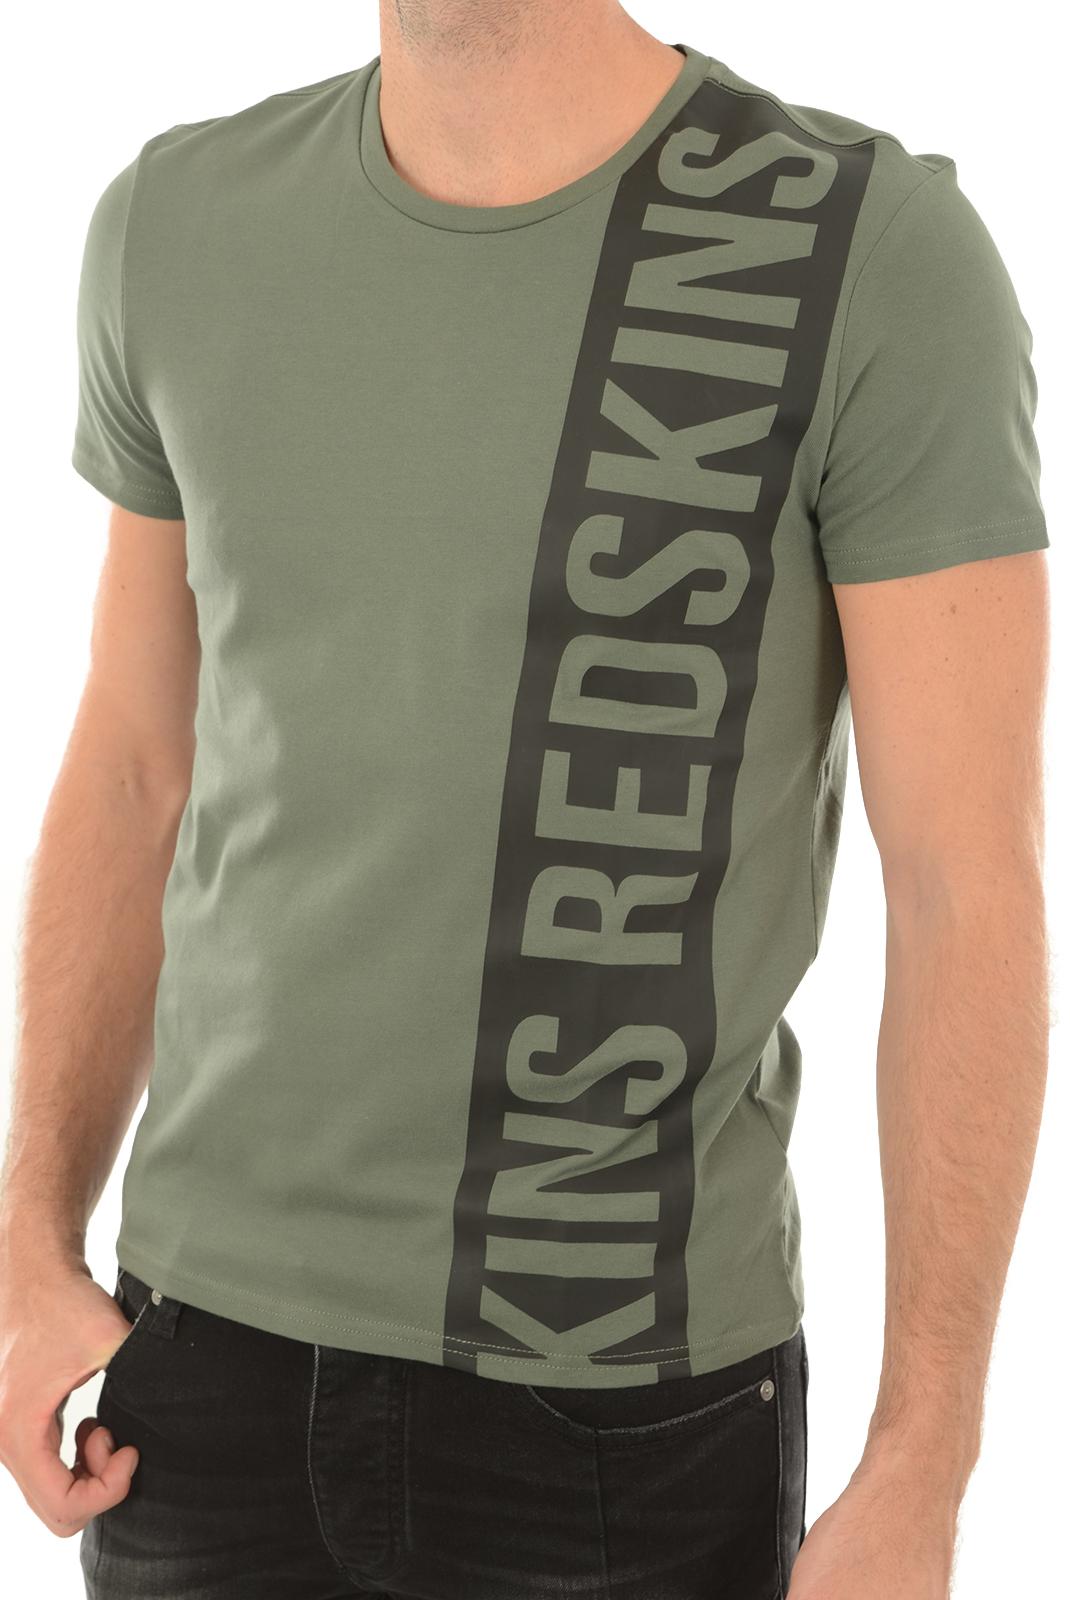 T-S manches courtes  Redskins RAFTING CALDER H17 KHAKI